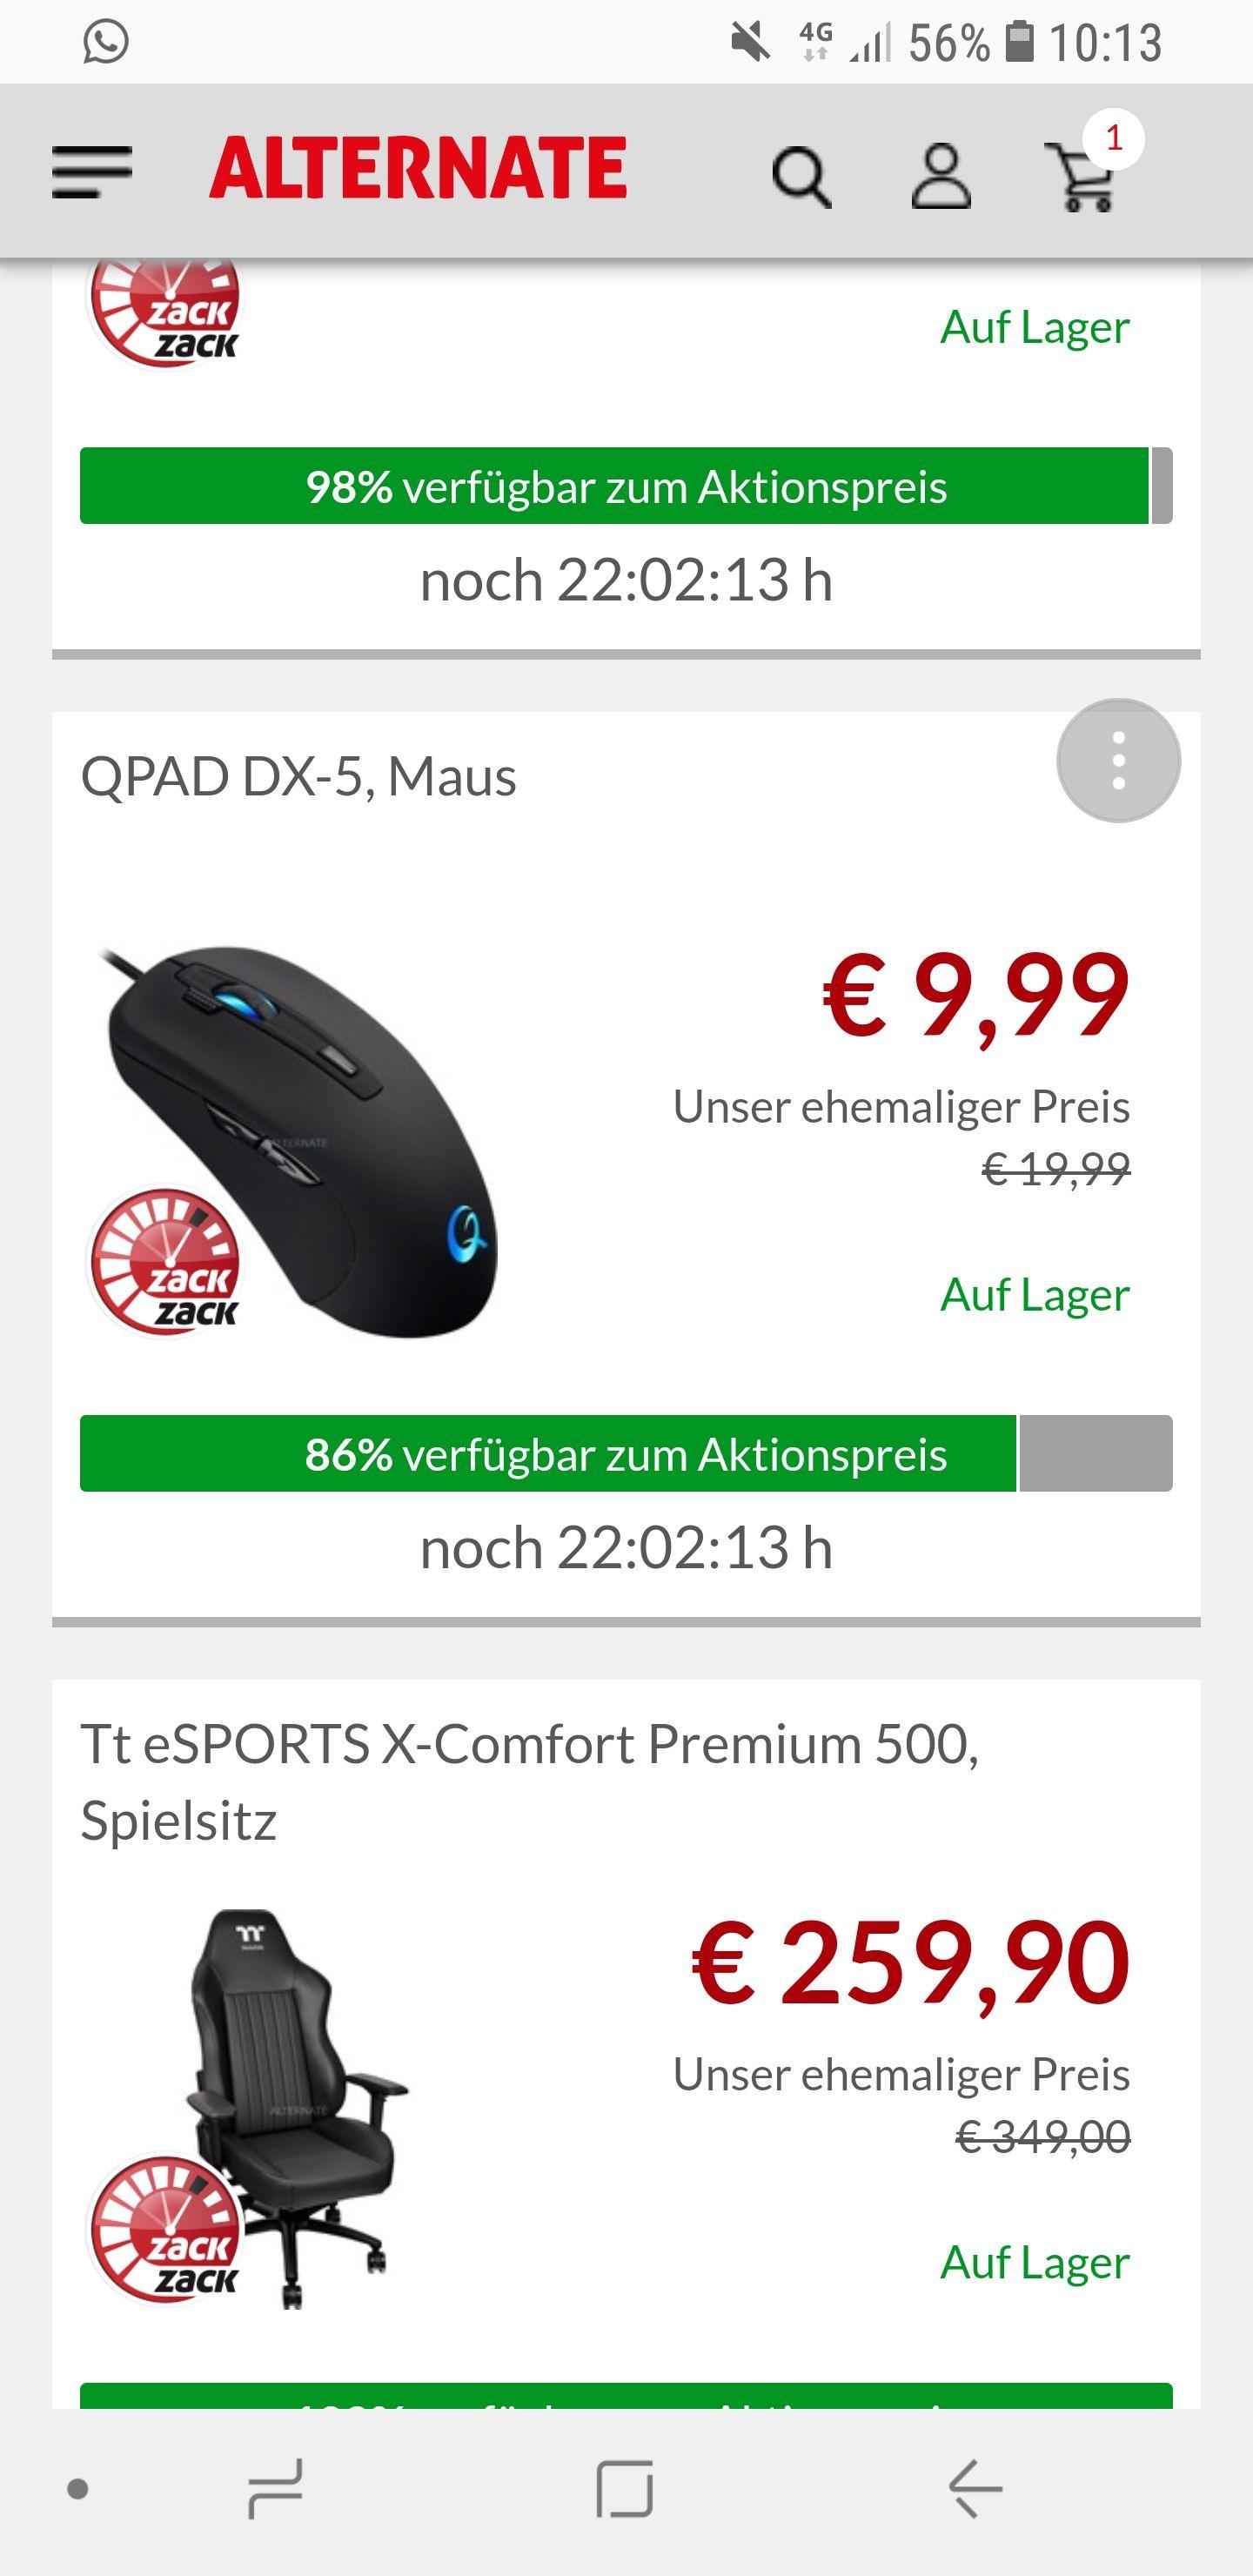 QPAD DX-5 Maus Alternate